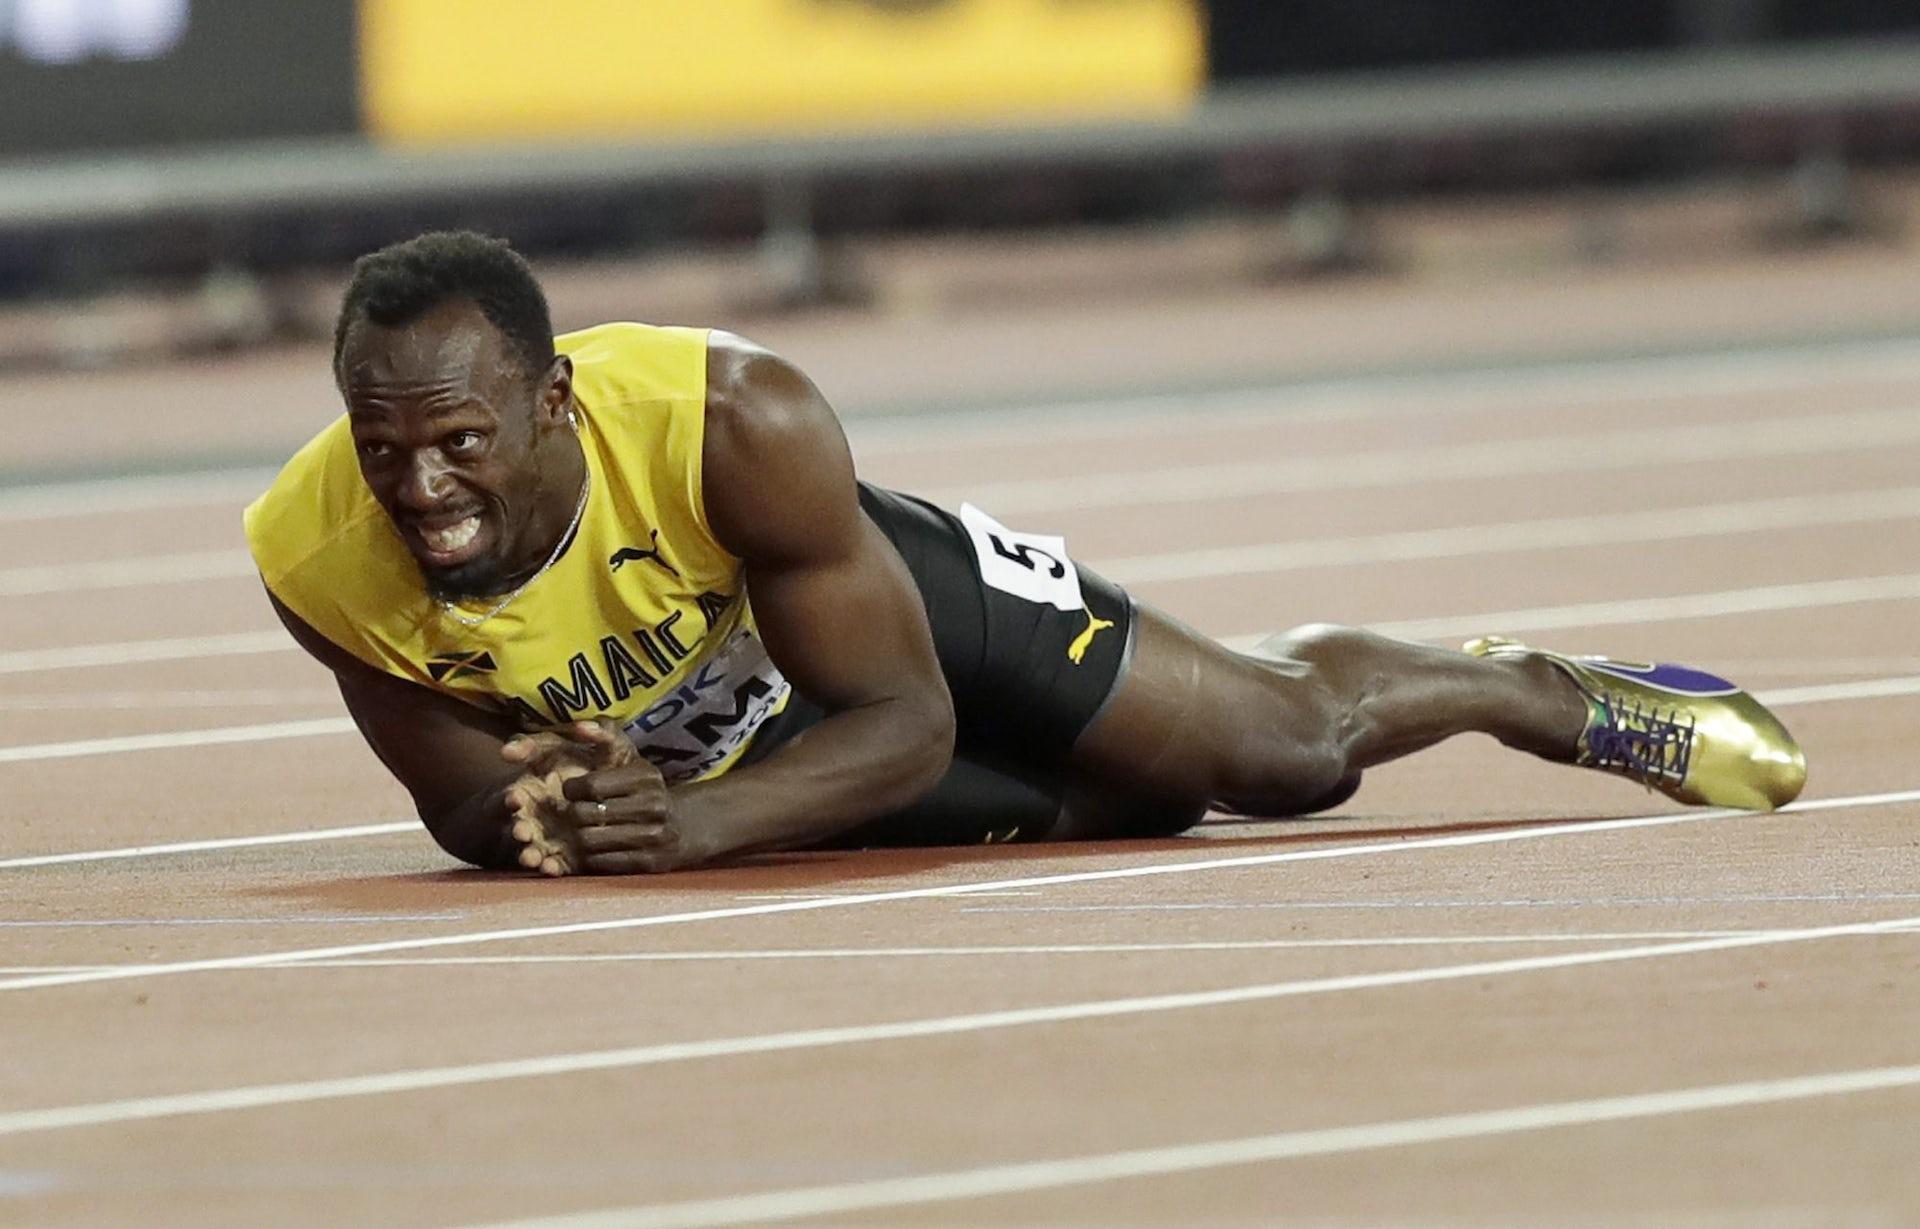 Sprinting injuries